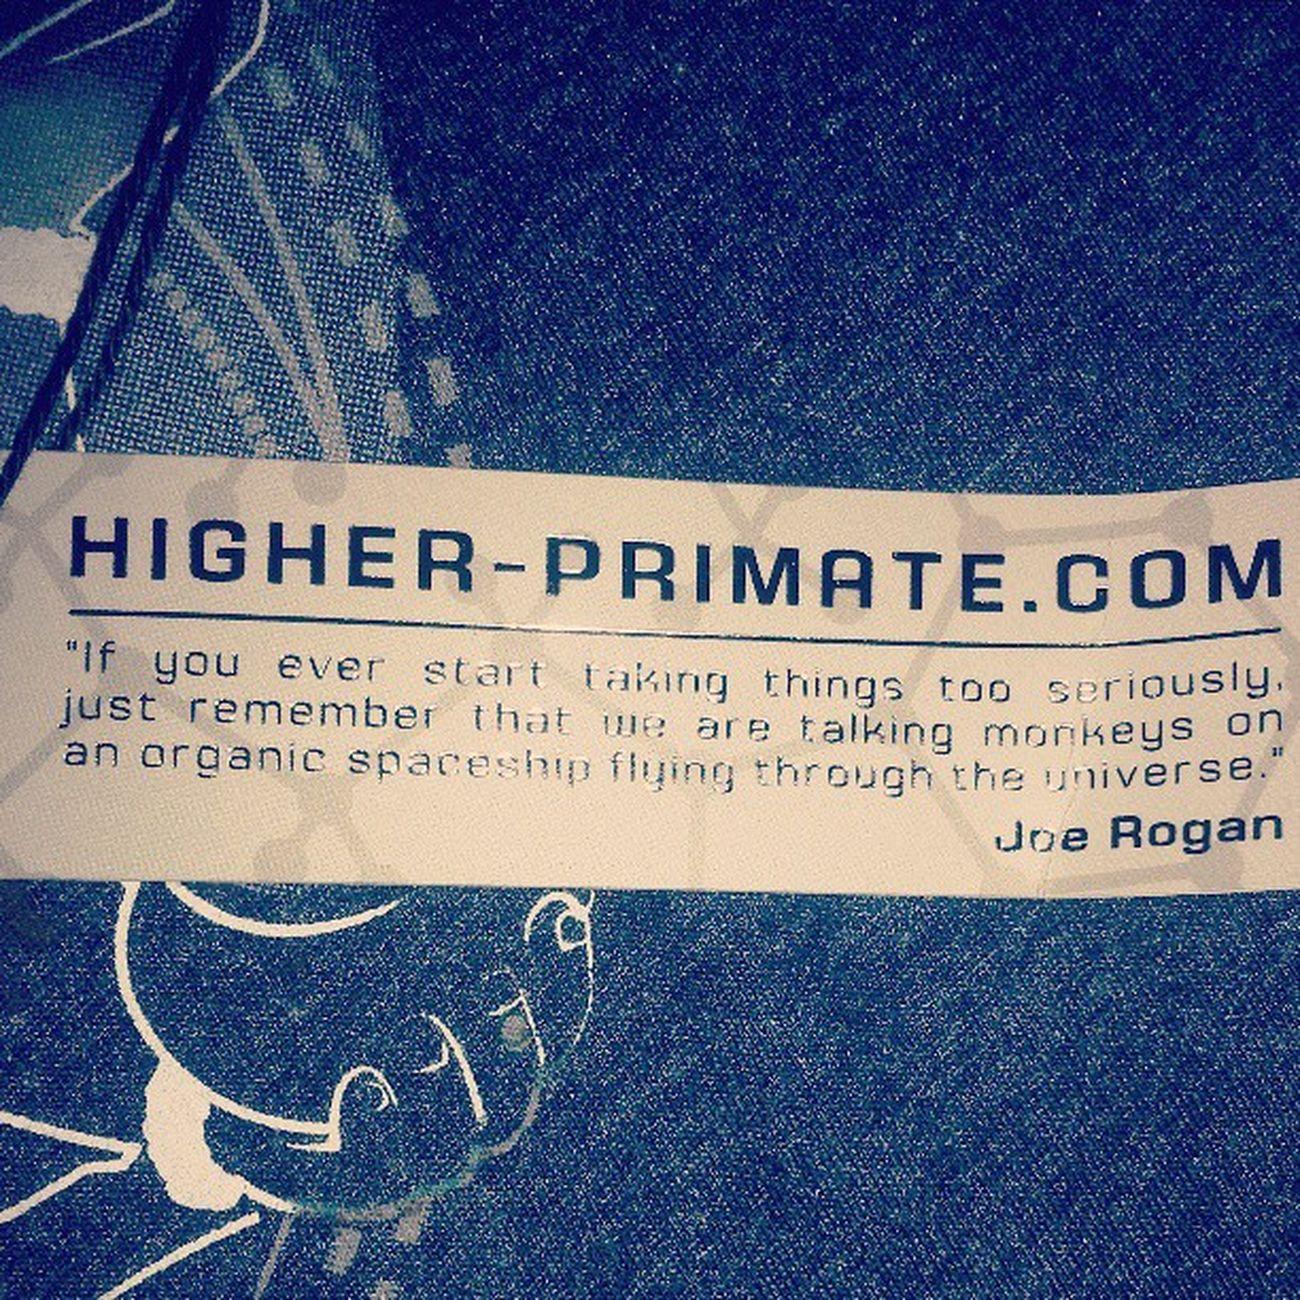 Higherprimate Joerogan @joerogan Chill Relax universe